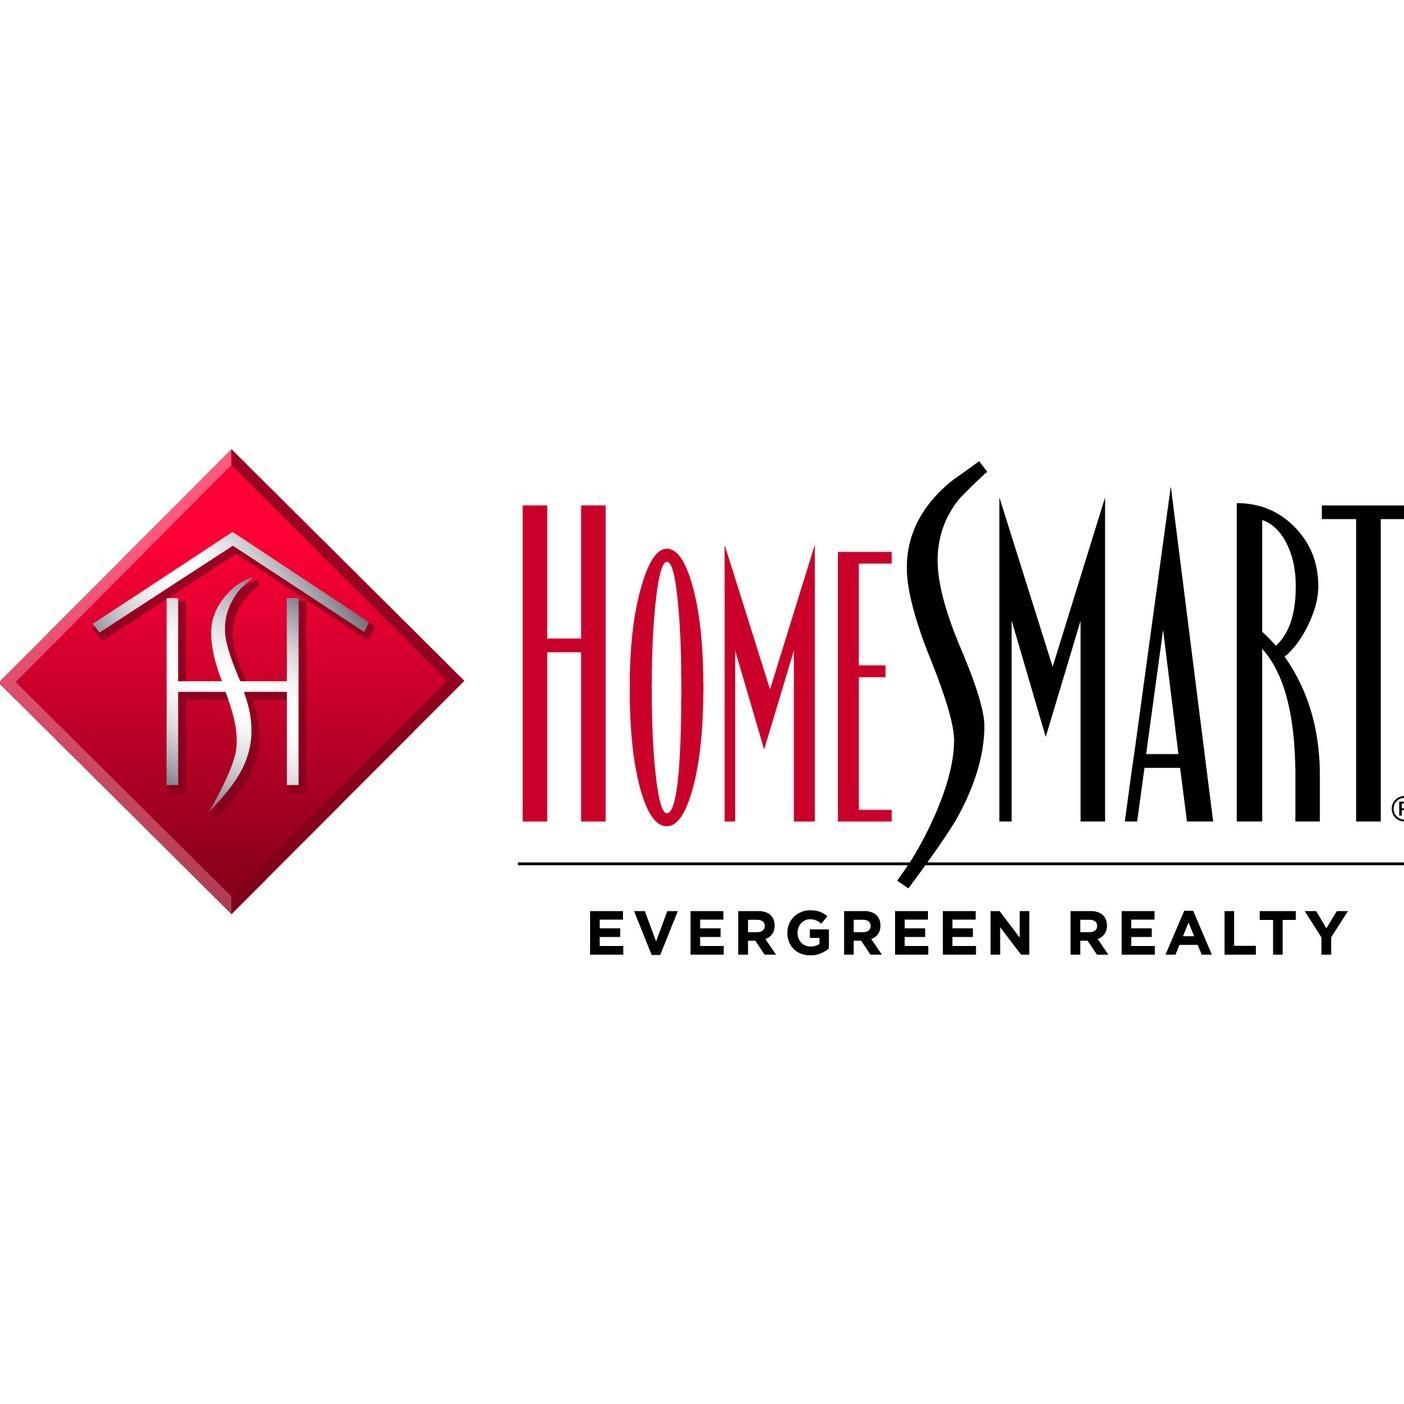 Marisela Skidmore | HomeSmart Evergreen Realty - Mission Viejo, CA 92692 - (949)275-5229 | ShowMeLocal.com